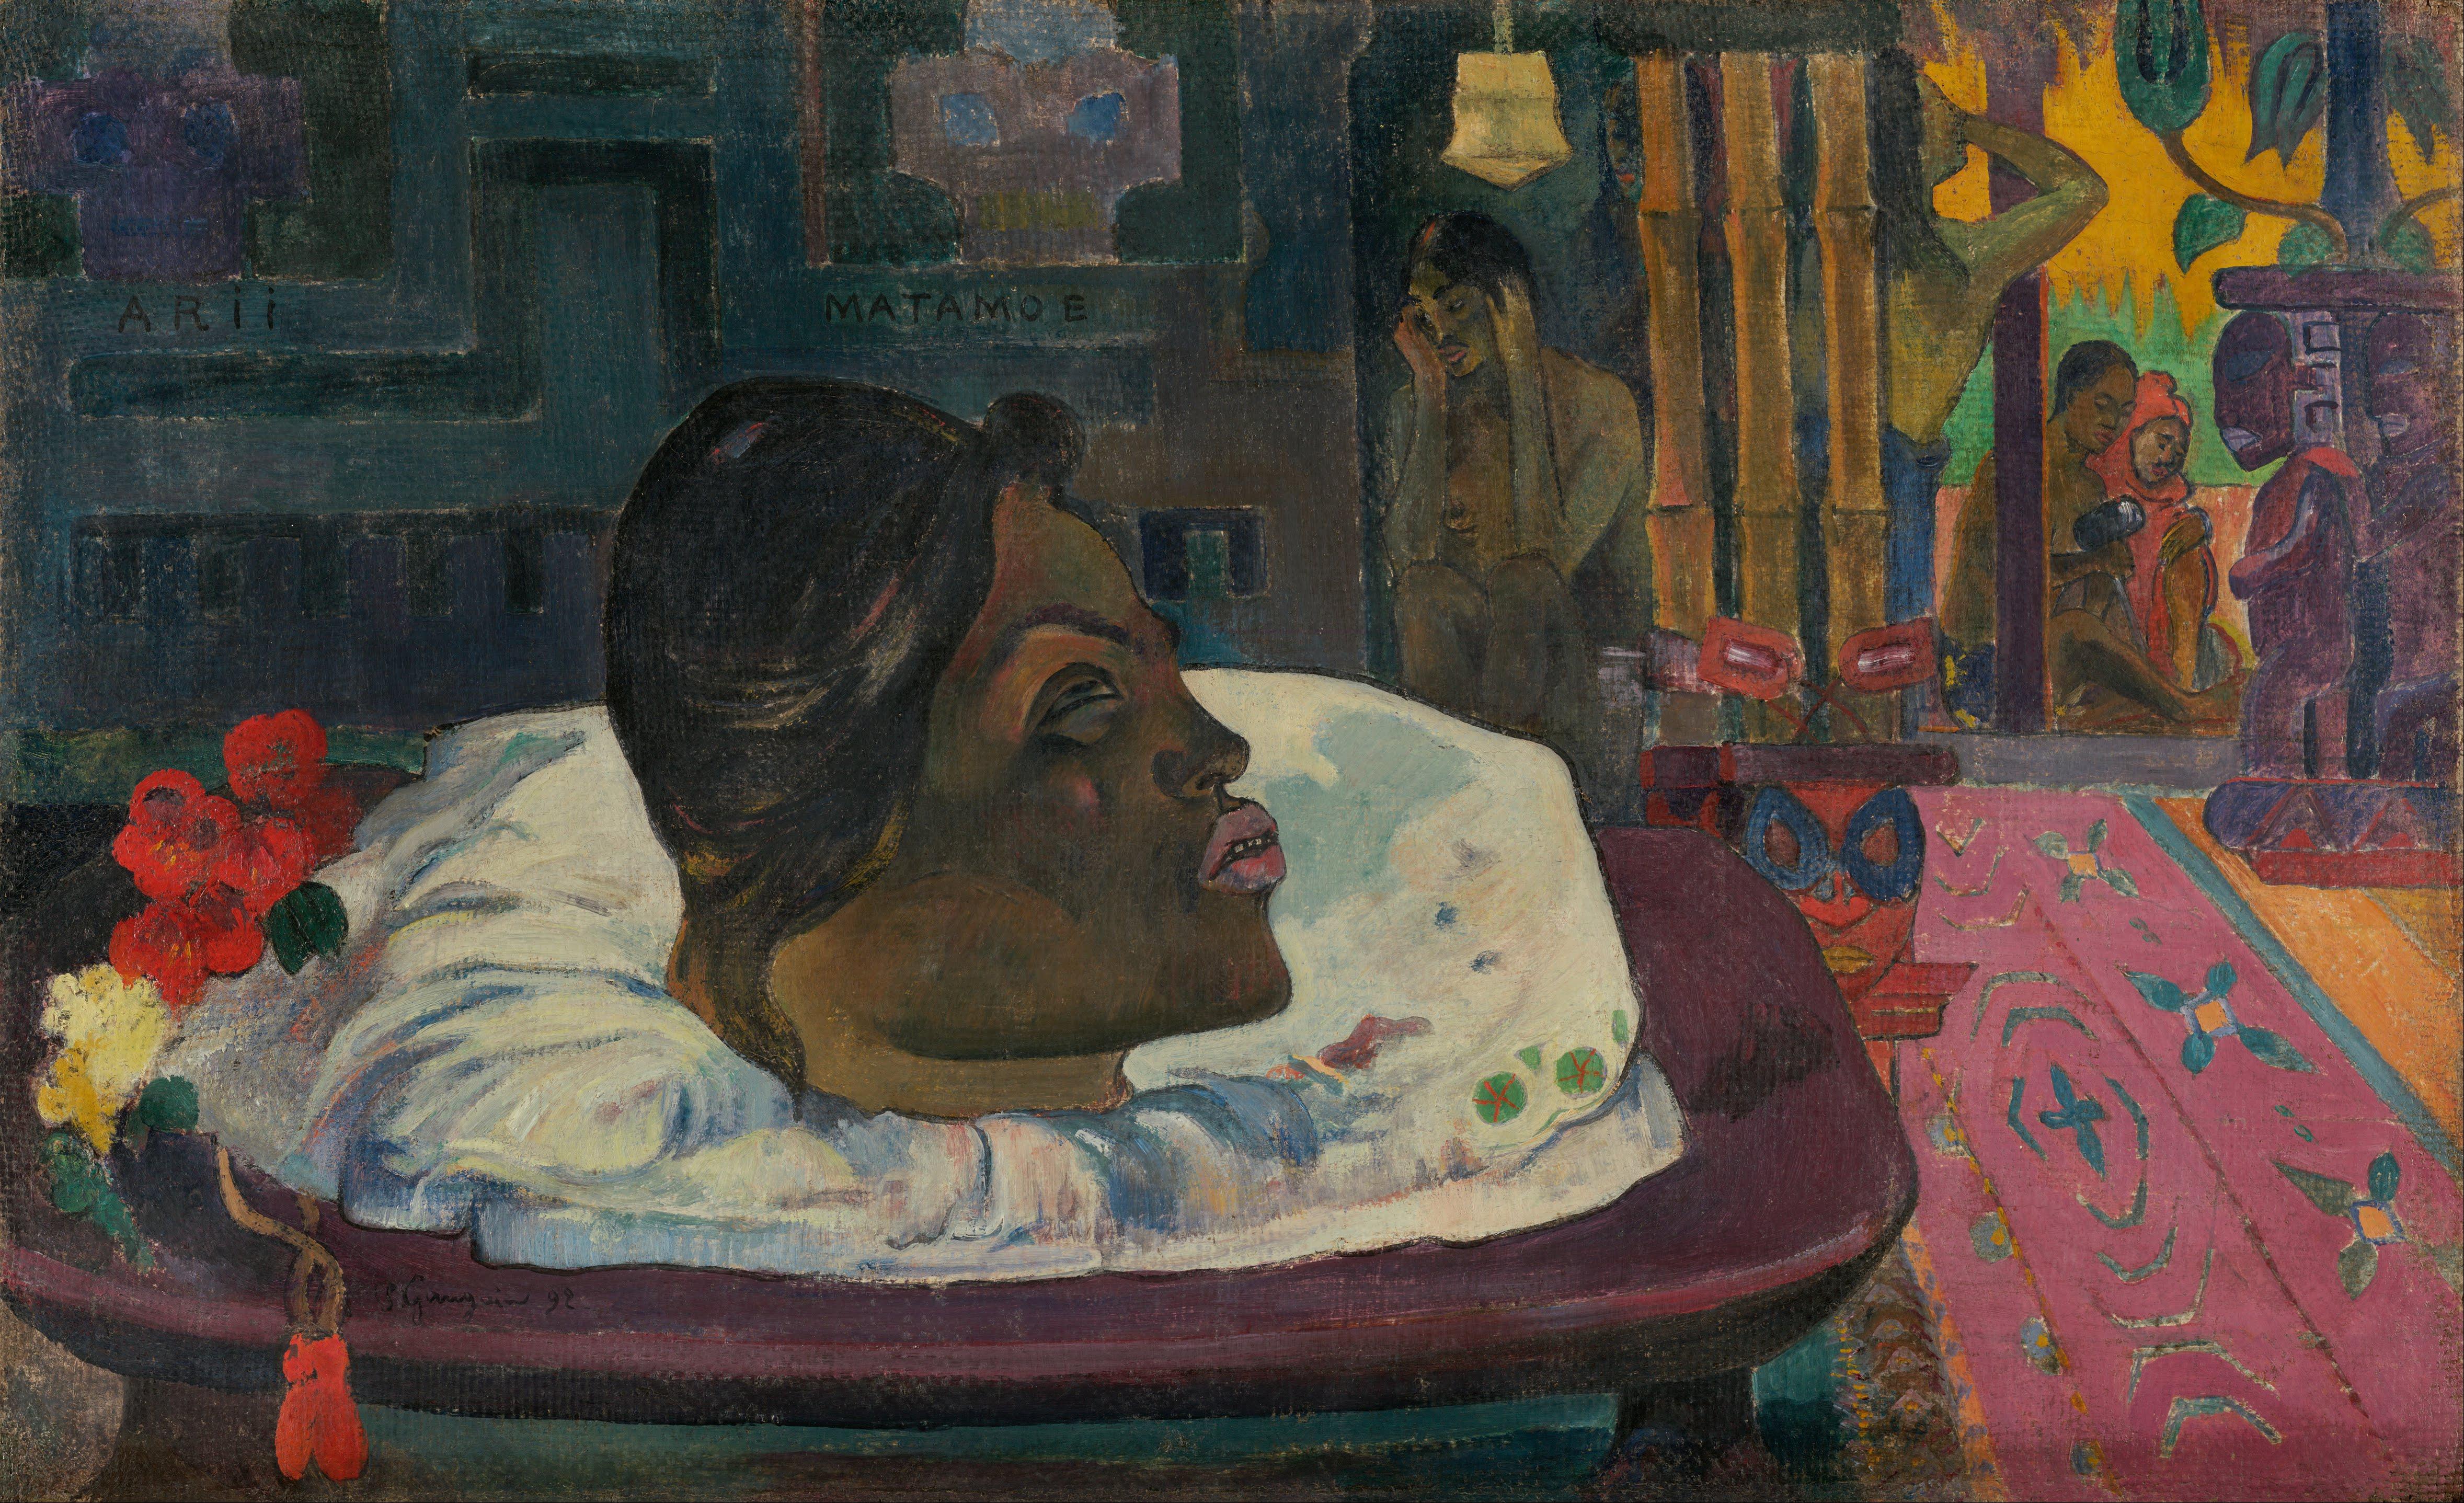 https://upload.wikimedia.org/wikipedia/commons/c/cd/Paul_Gauguin_%28French_-_Arii_Matamoe_%28The_Royal_End%29_-_Google_Art_Project.jpg